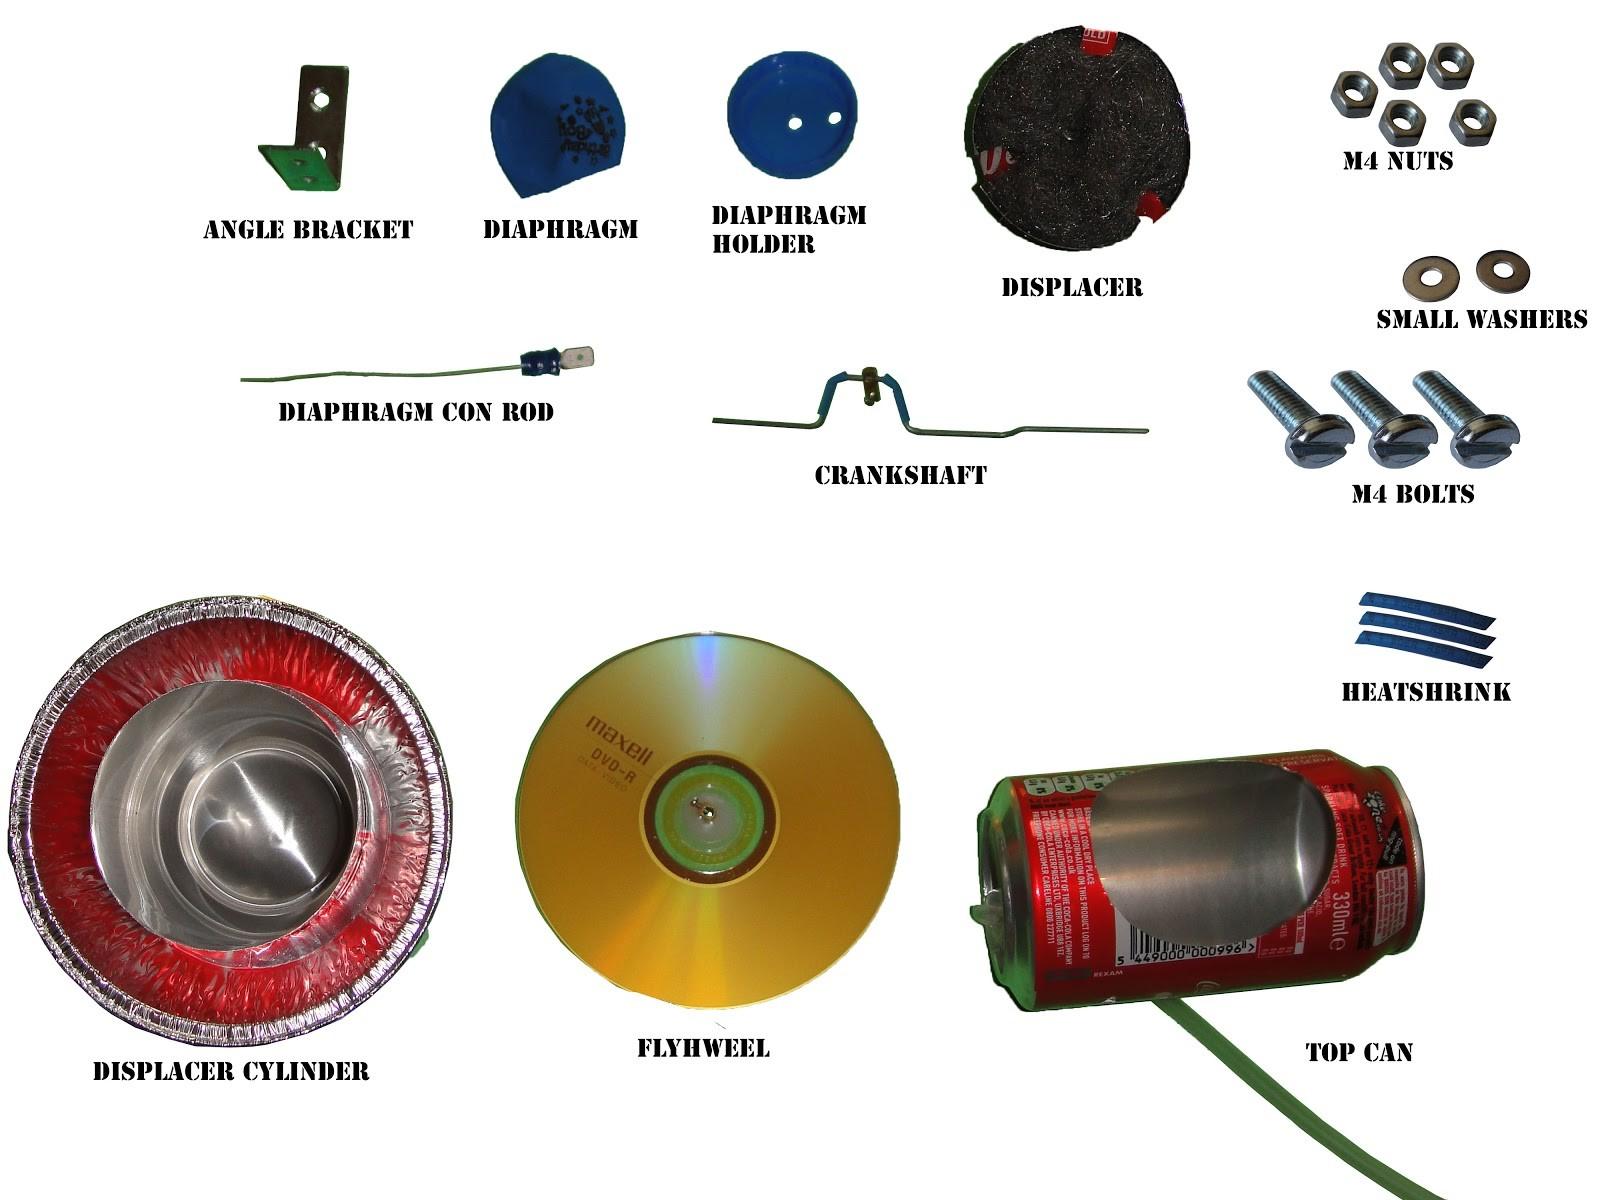 Candela Wiring Harness Candela Get Free Image About Wiring Diagram